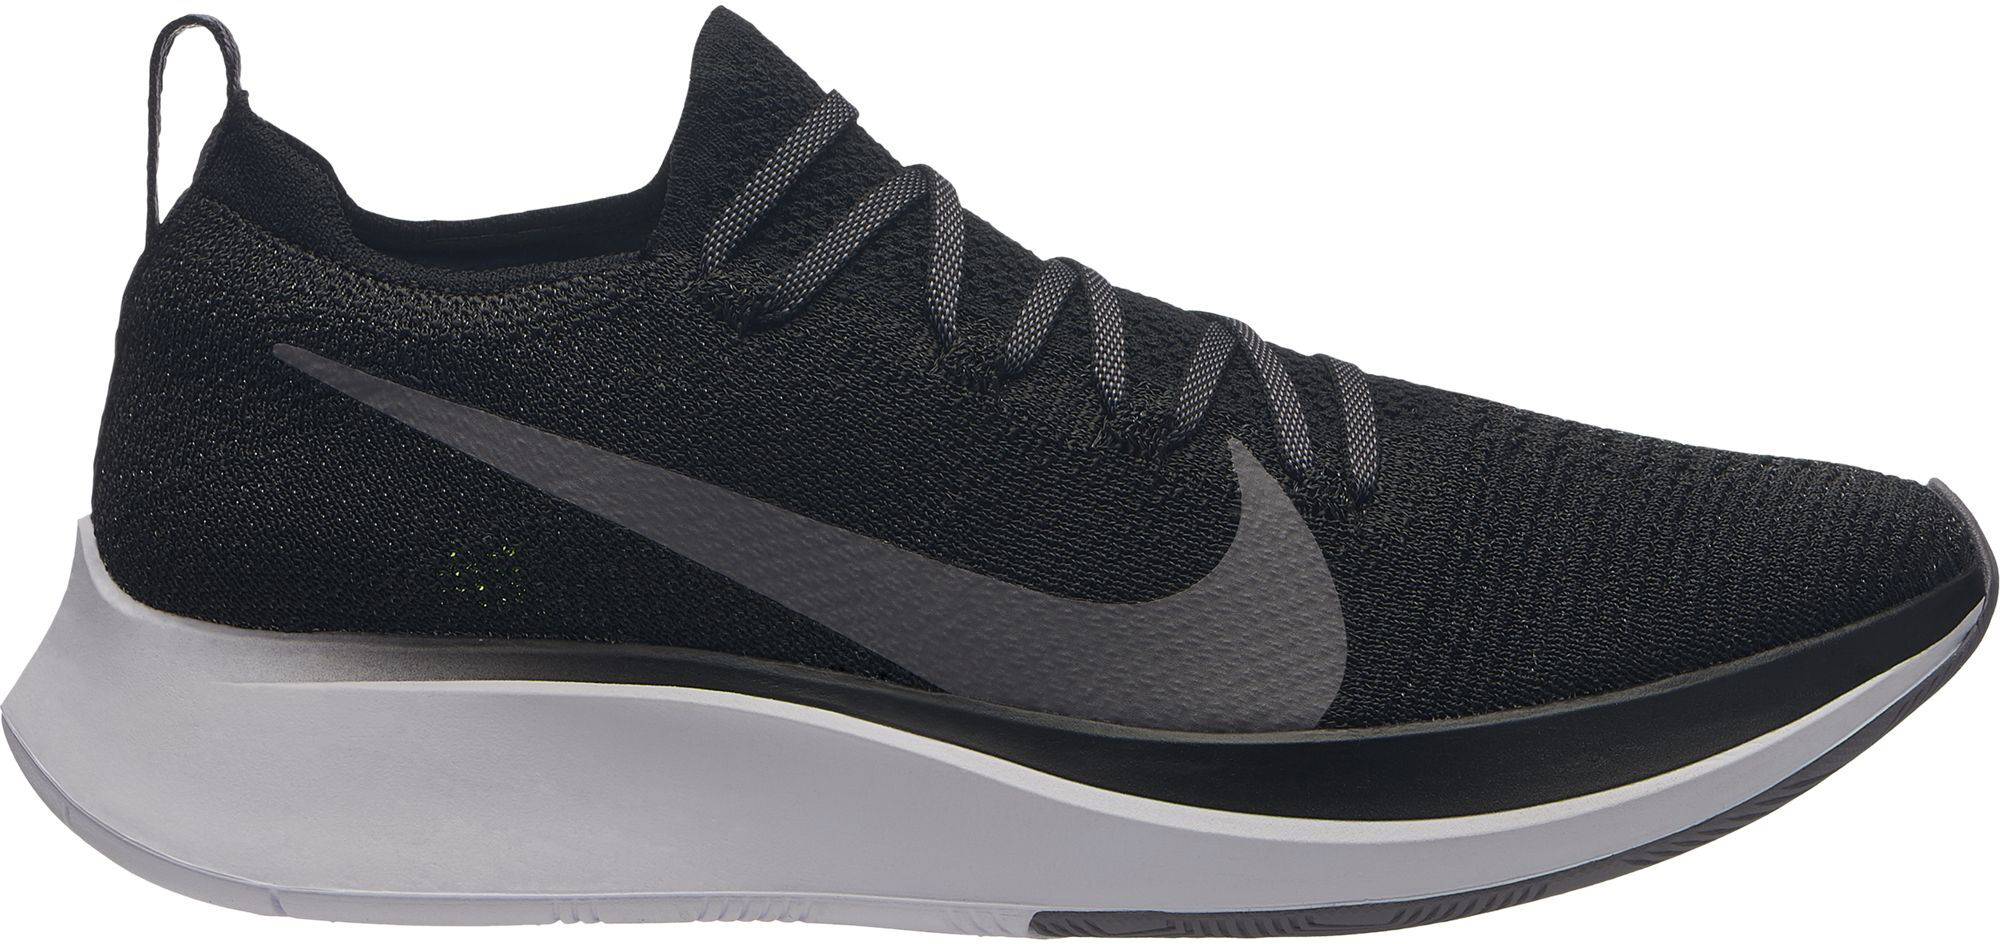 Schoenen Nike Nike Dames Dames Intersport w8a68tx